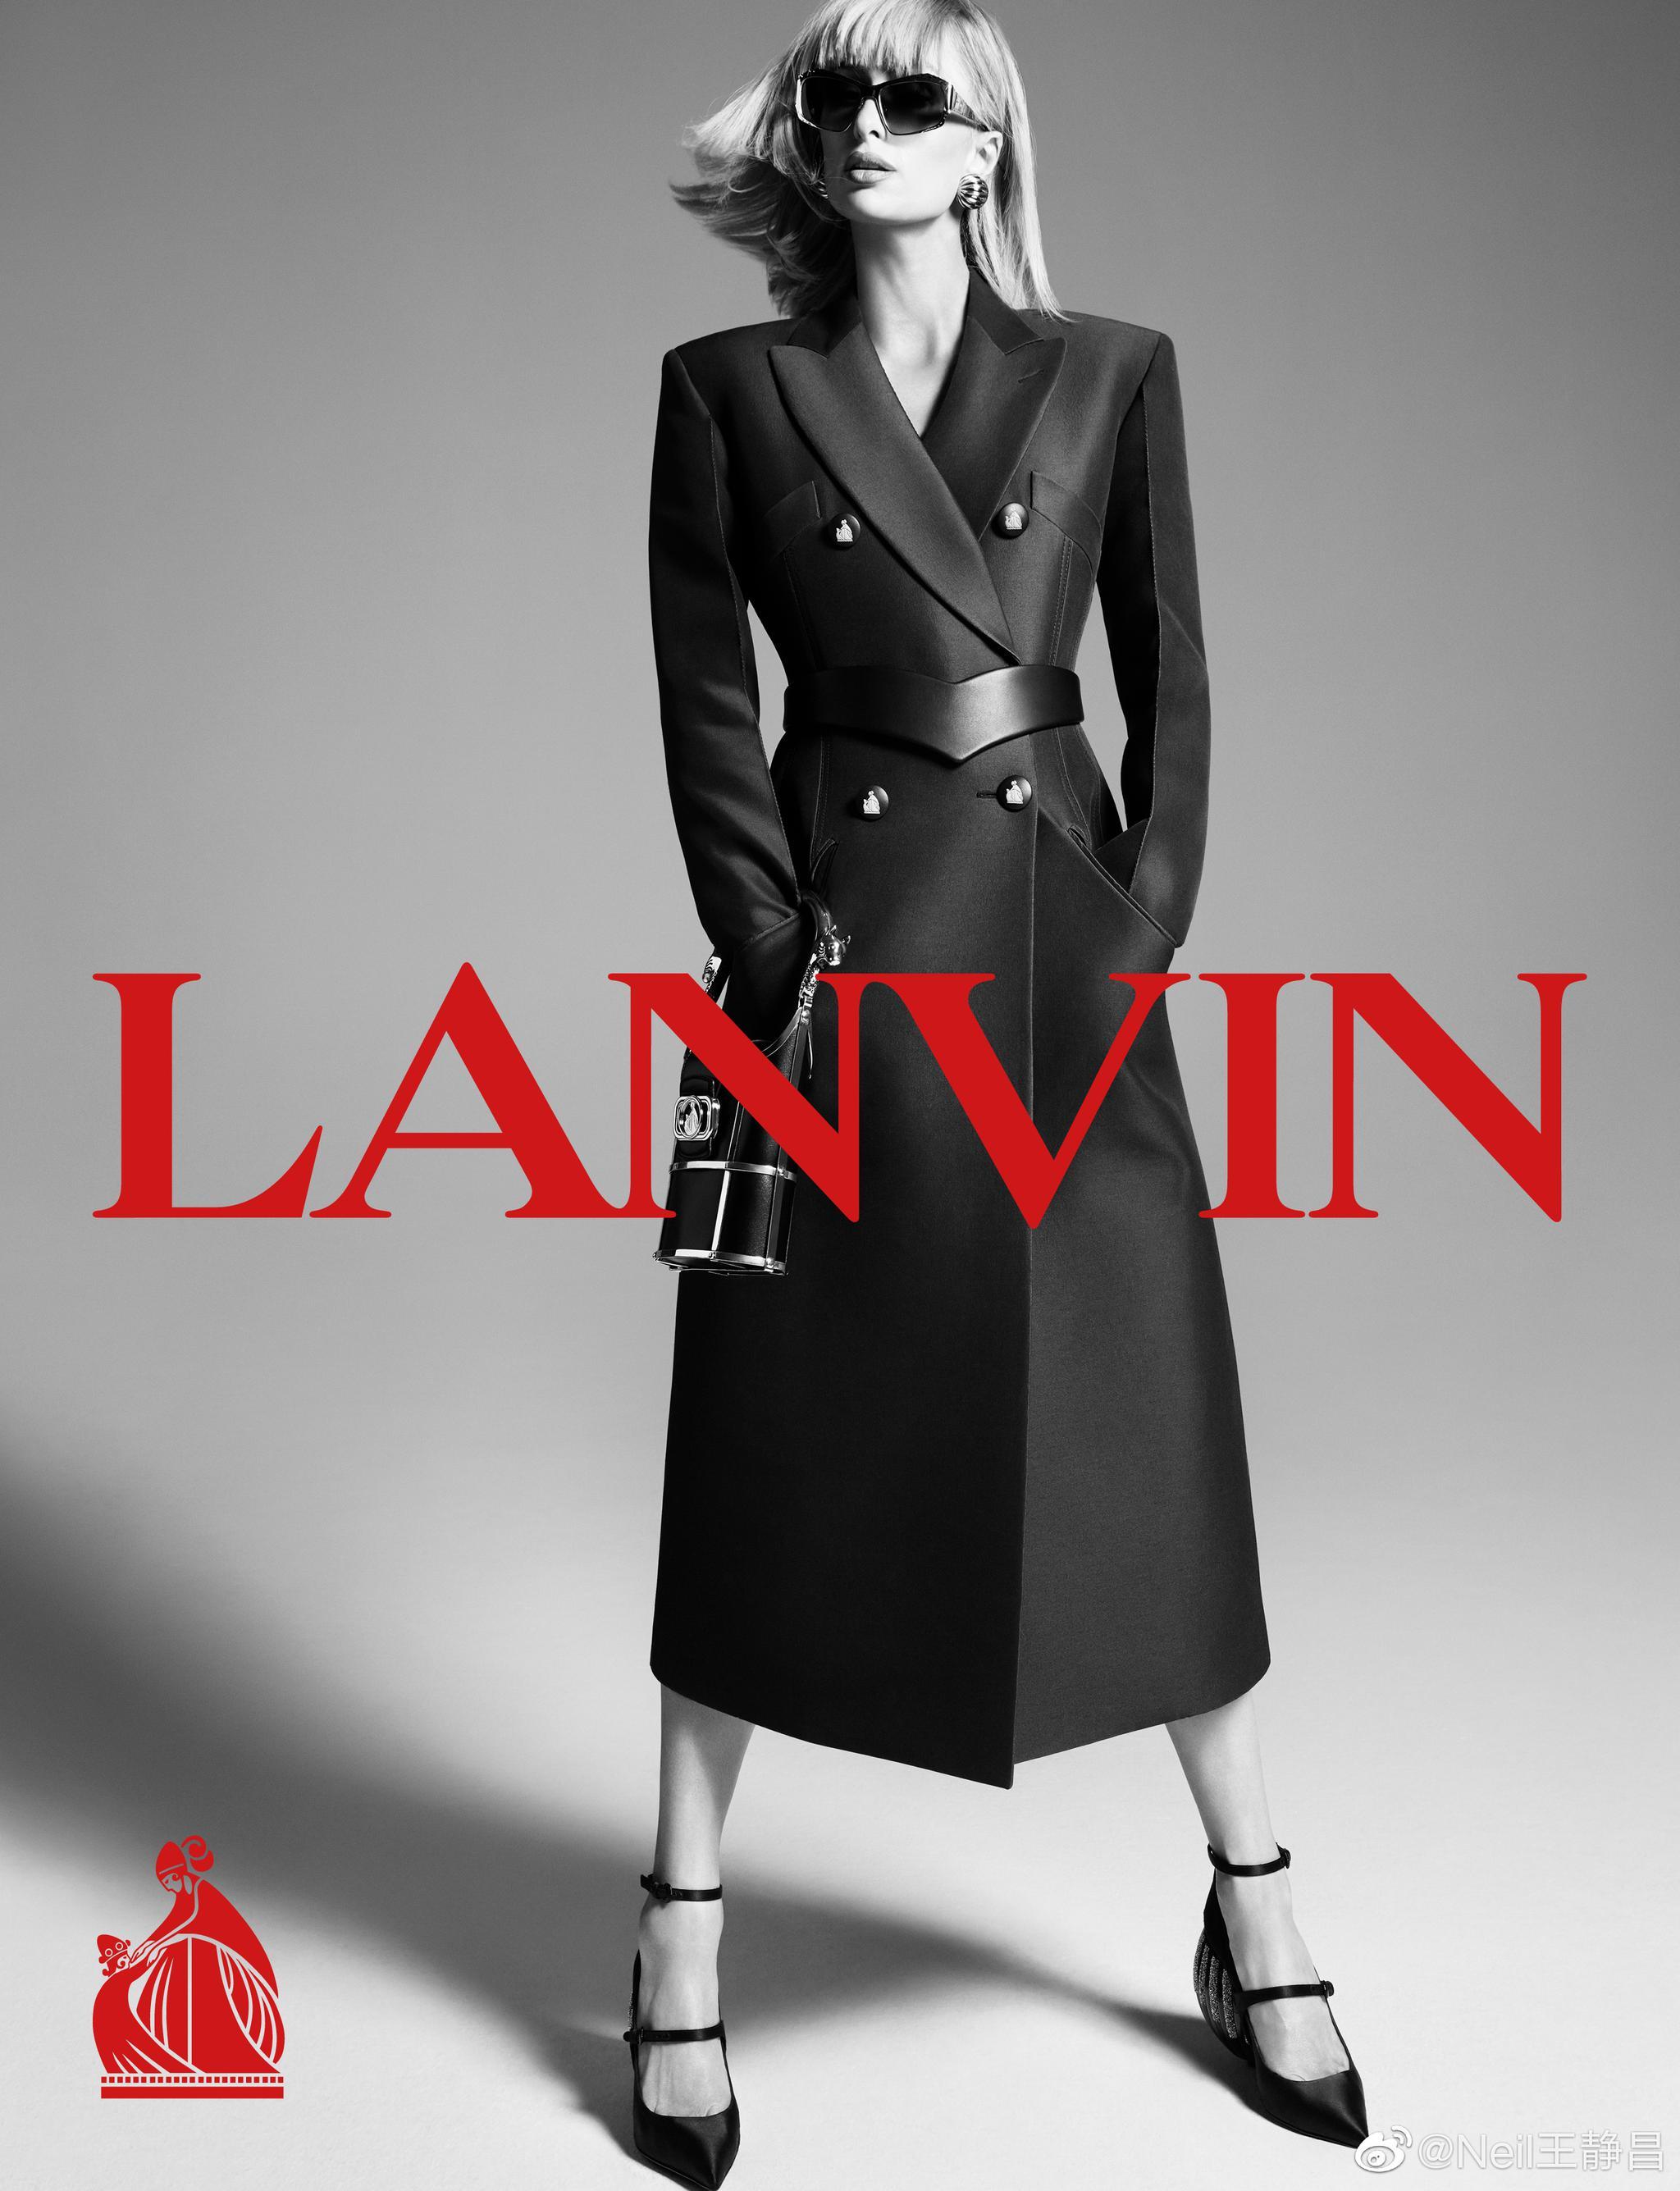 LANVIN 2021 春夏系列广告大片请来Paris Hilton 作为模特……